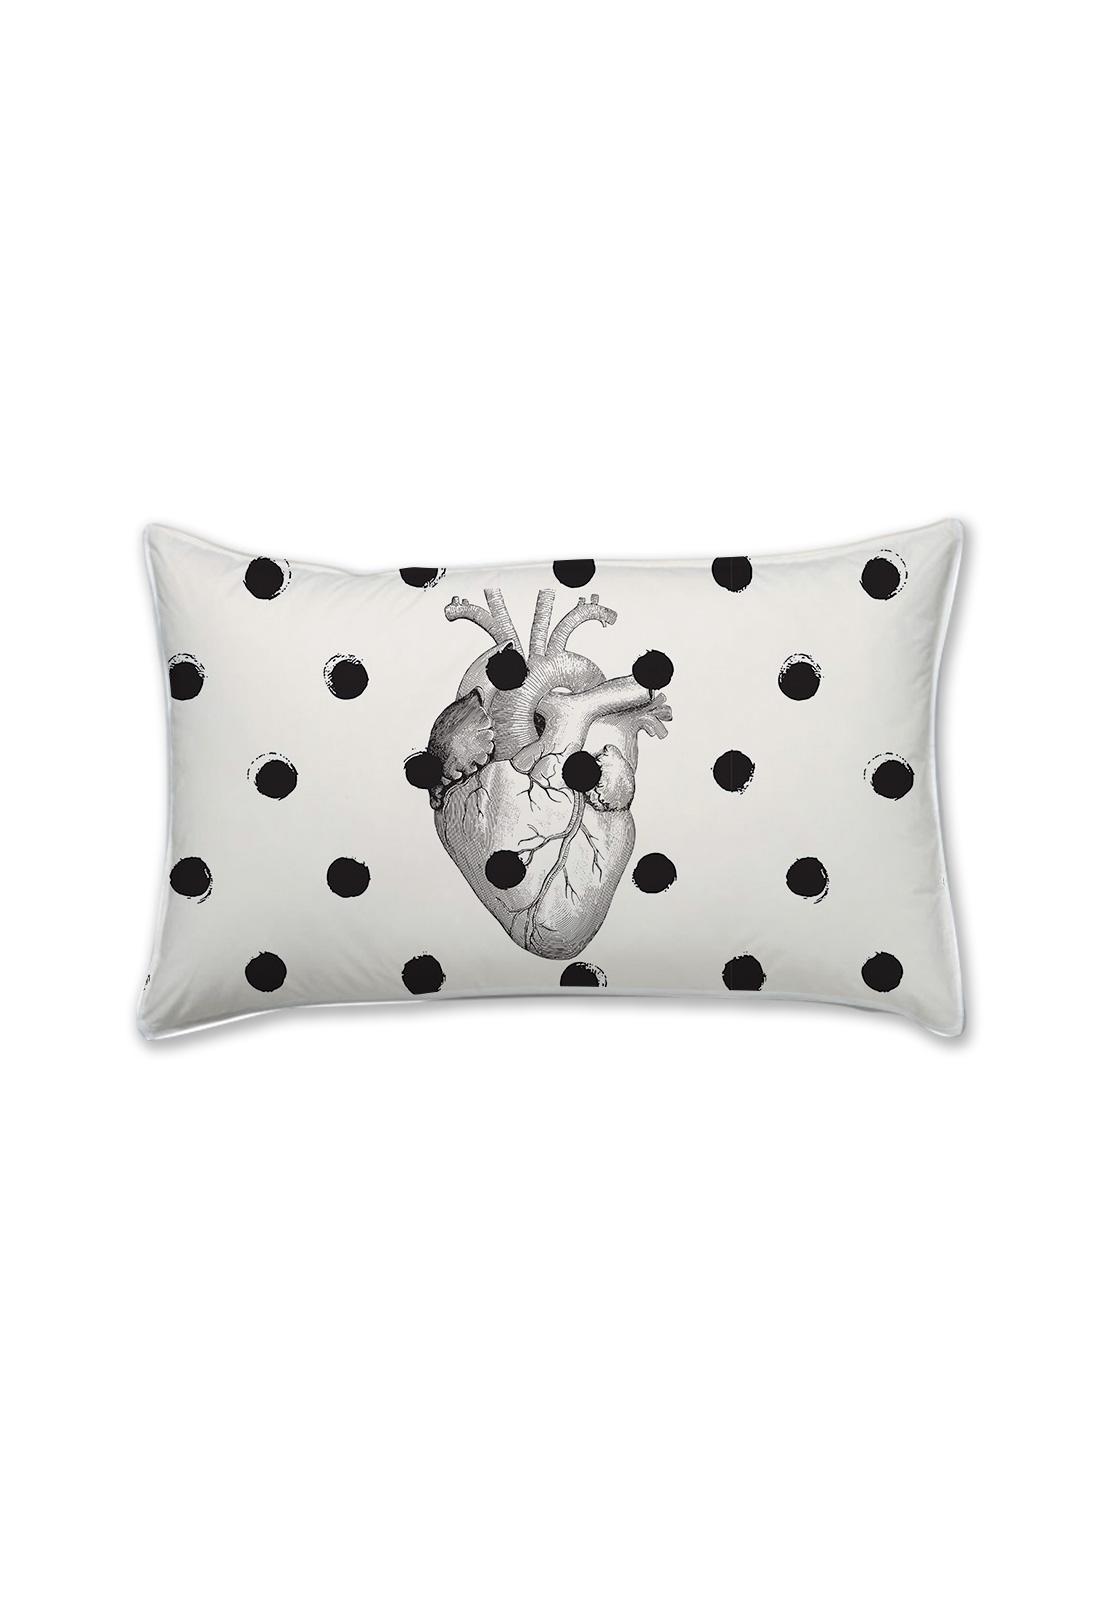 Mini almohada corazon puntos negro